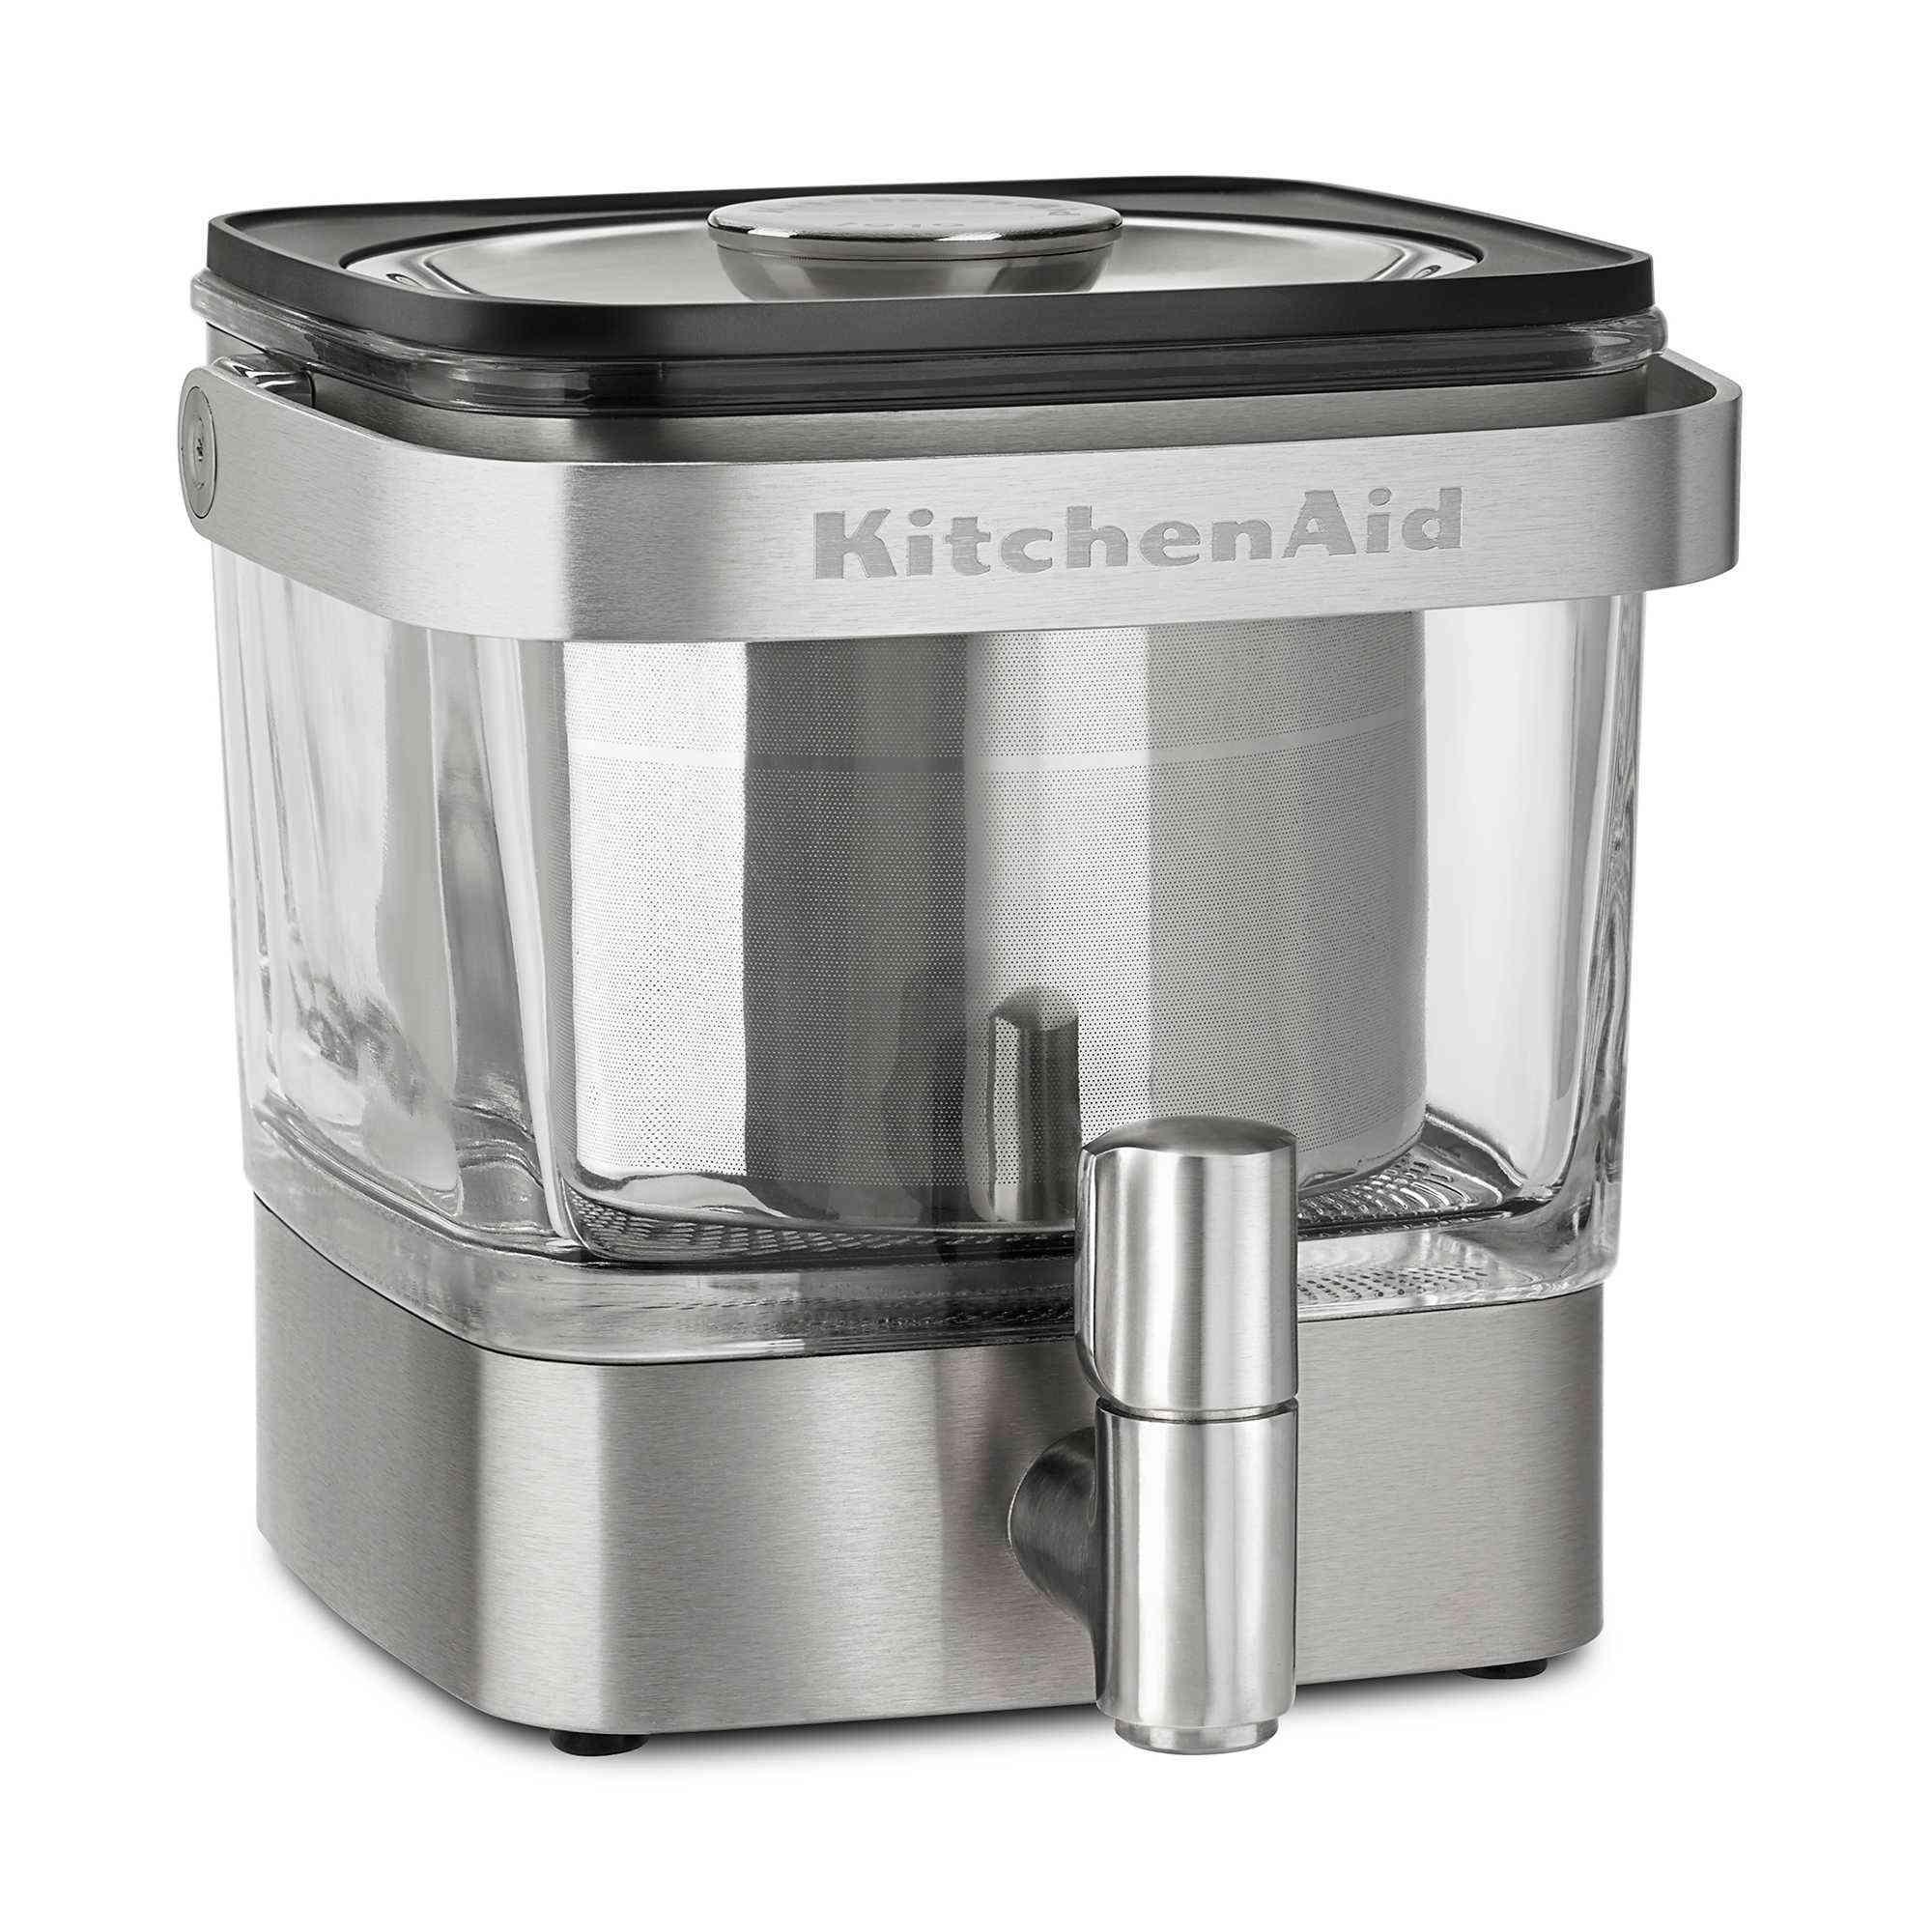 kitchen-aid-cold-brew-coffee-maker